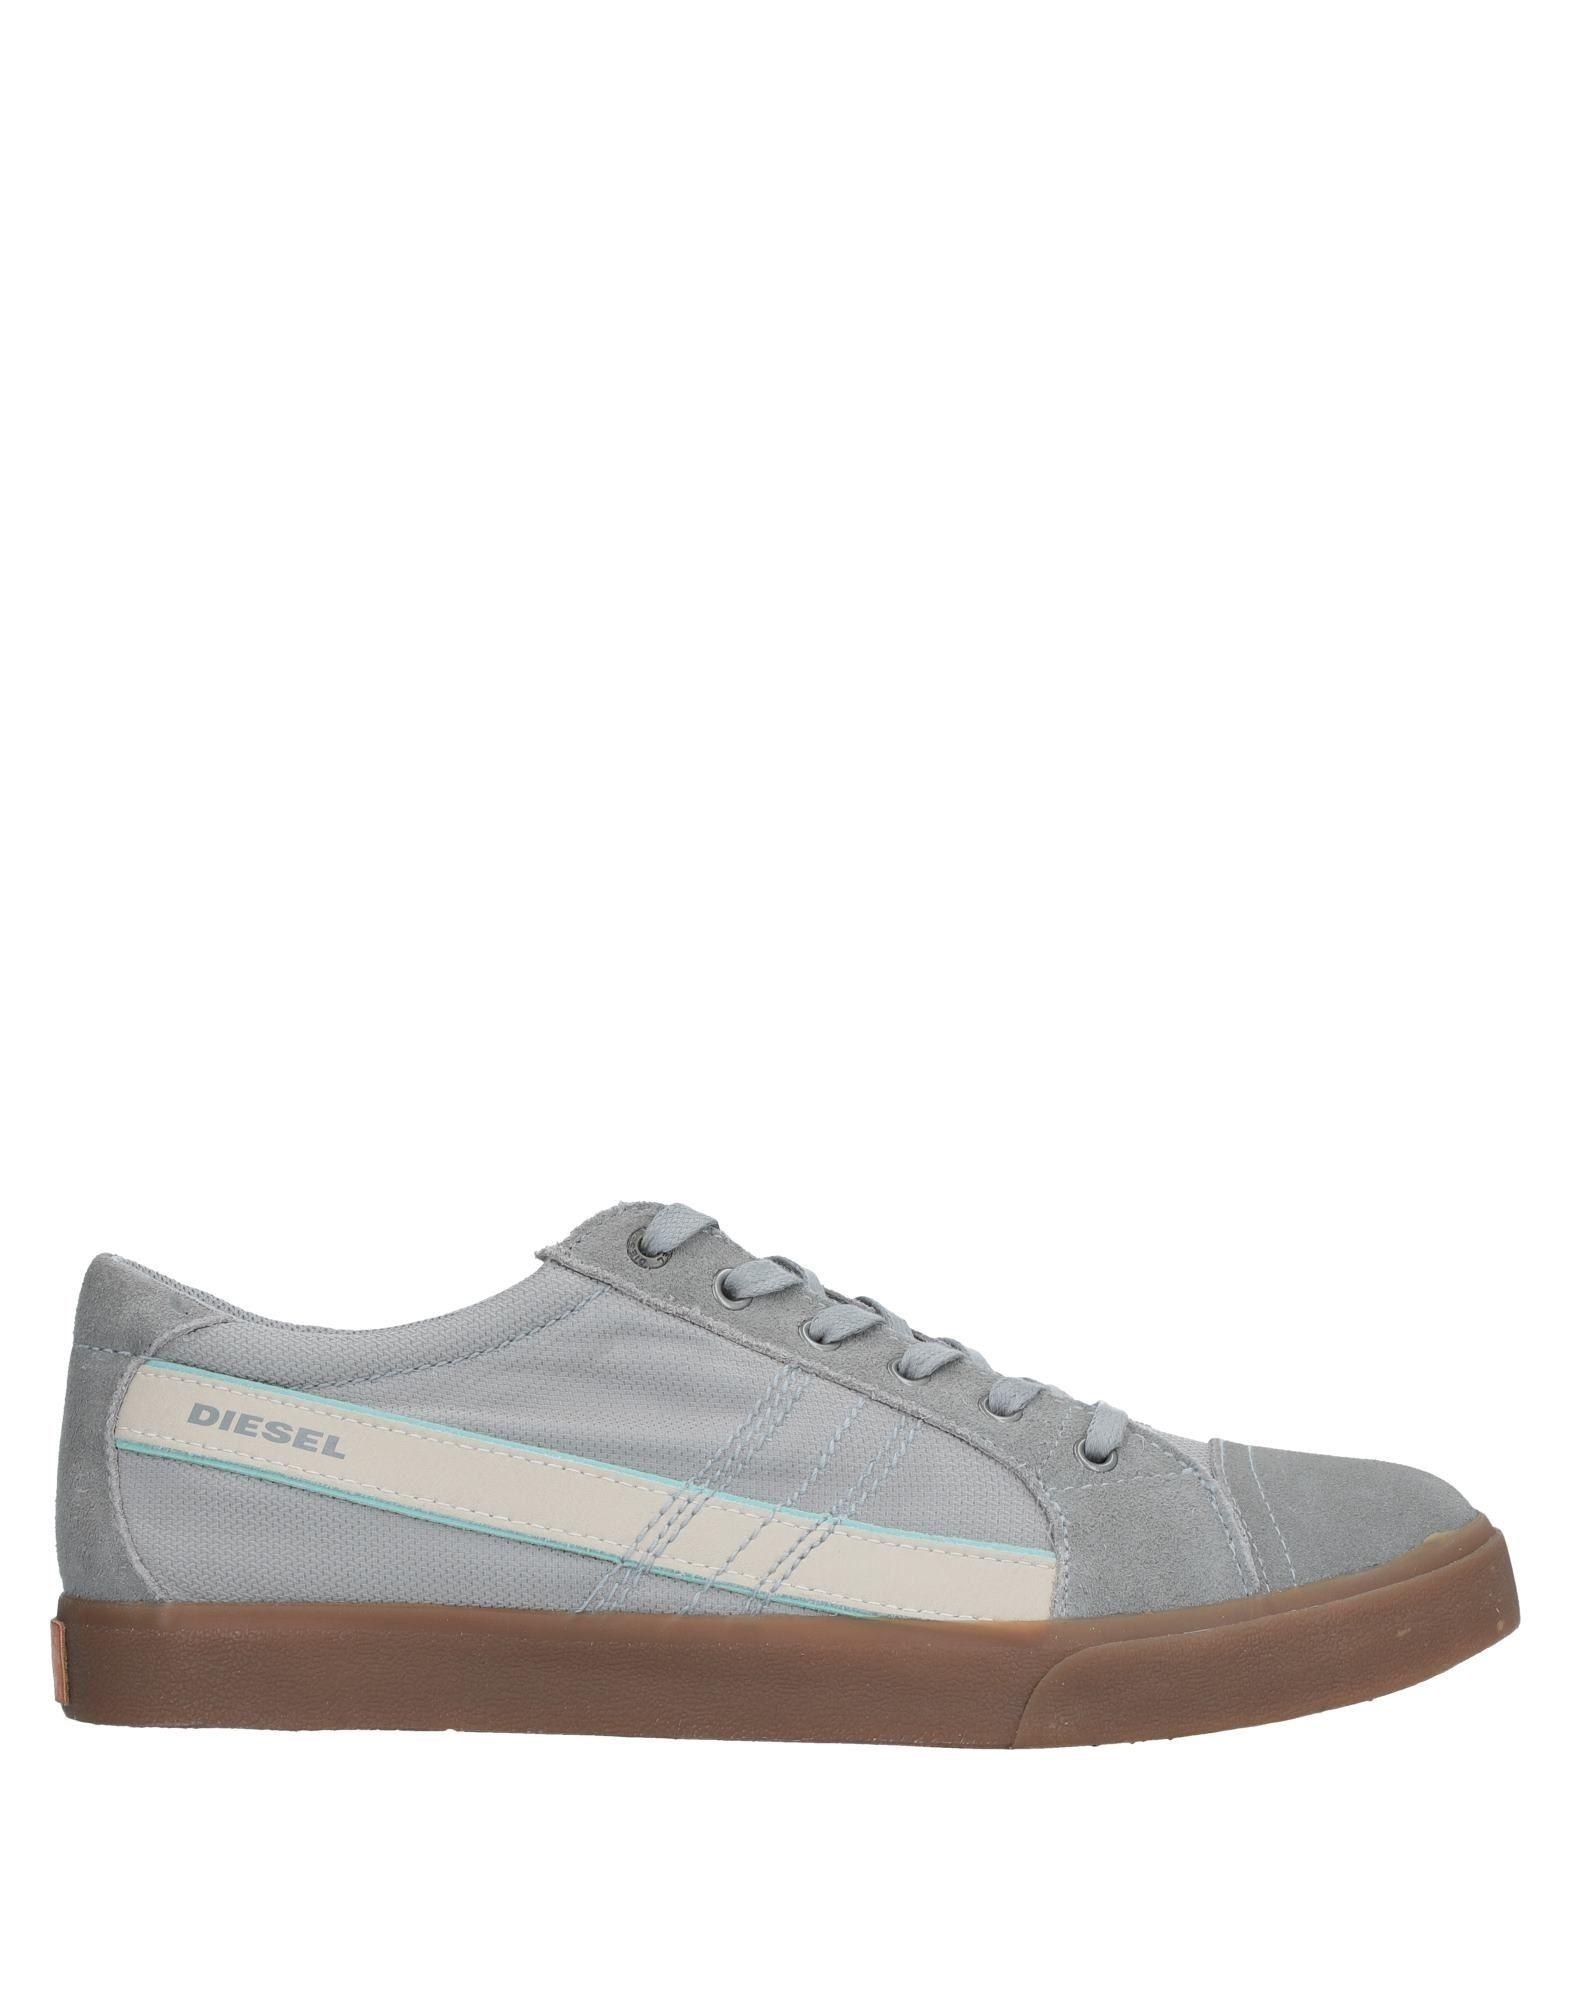 Rabatt echte Schuhe Diesel  Sneakers Herren  Diesel 11533477OJ b6f927